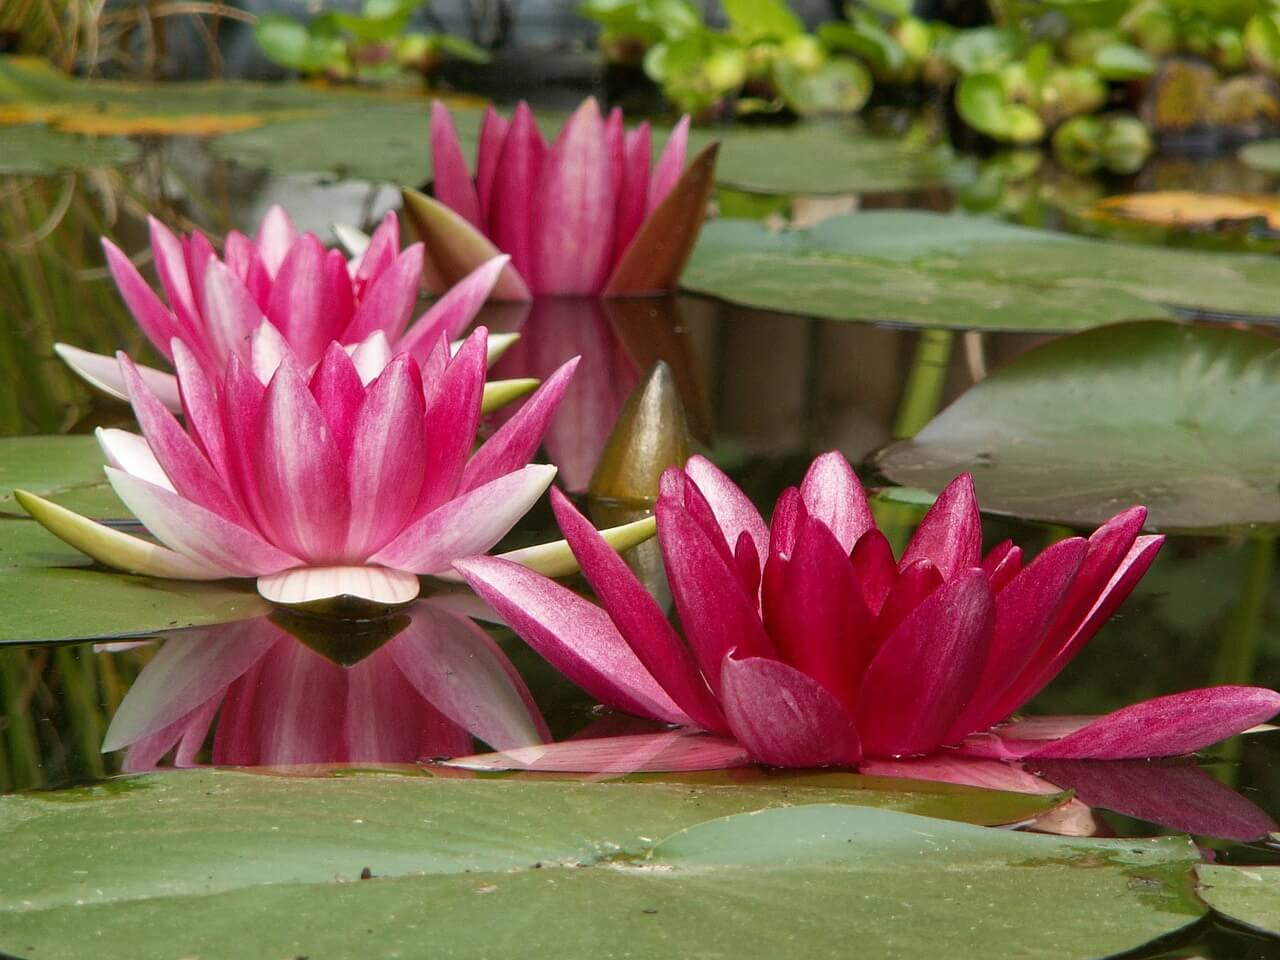 aquatic-plant-182635_1280.jpg